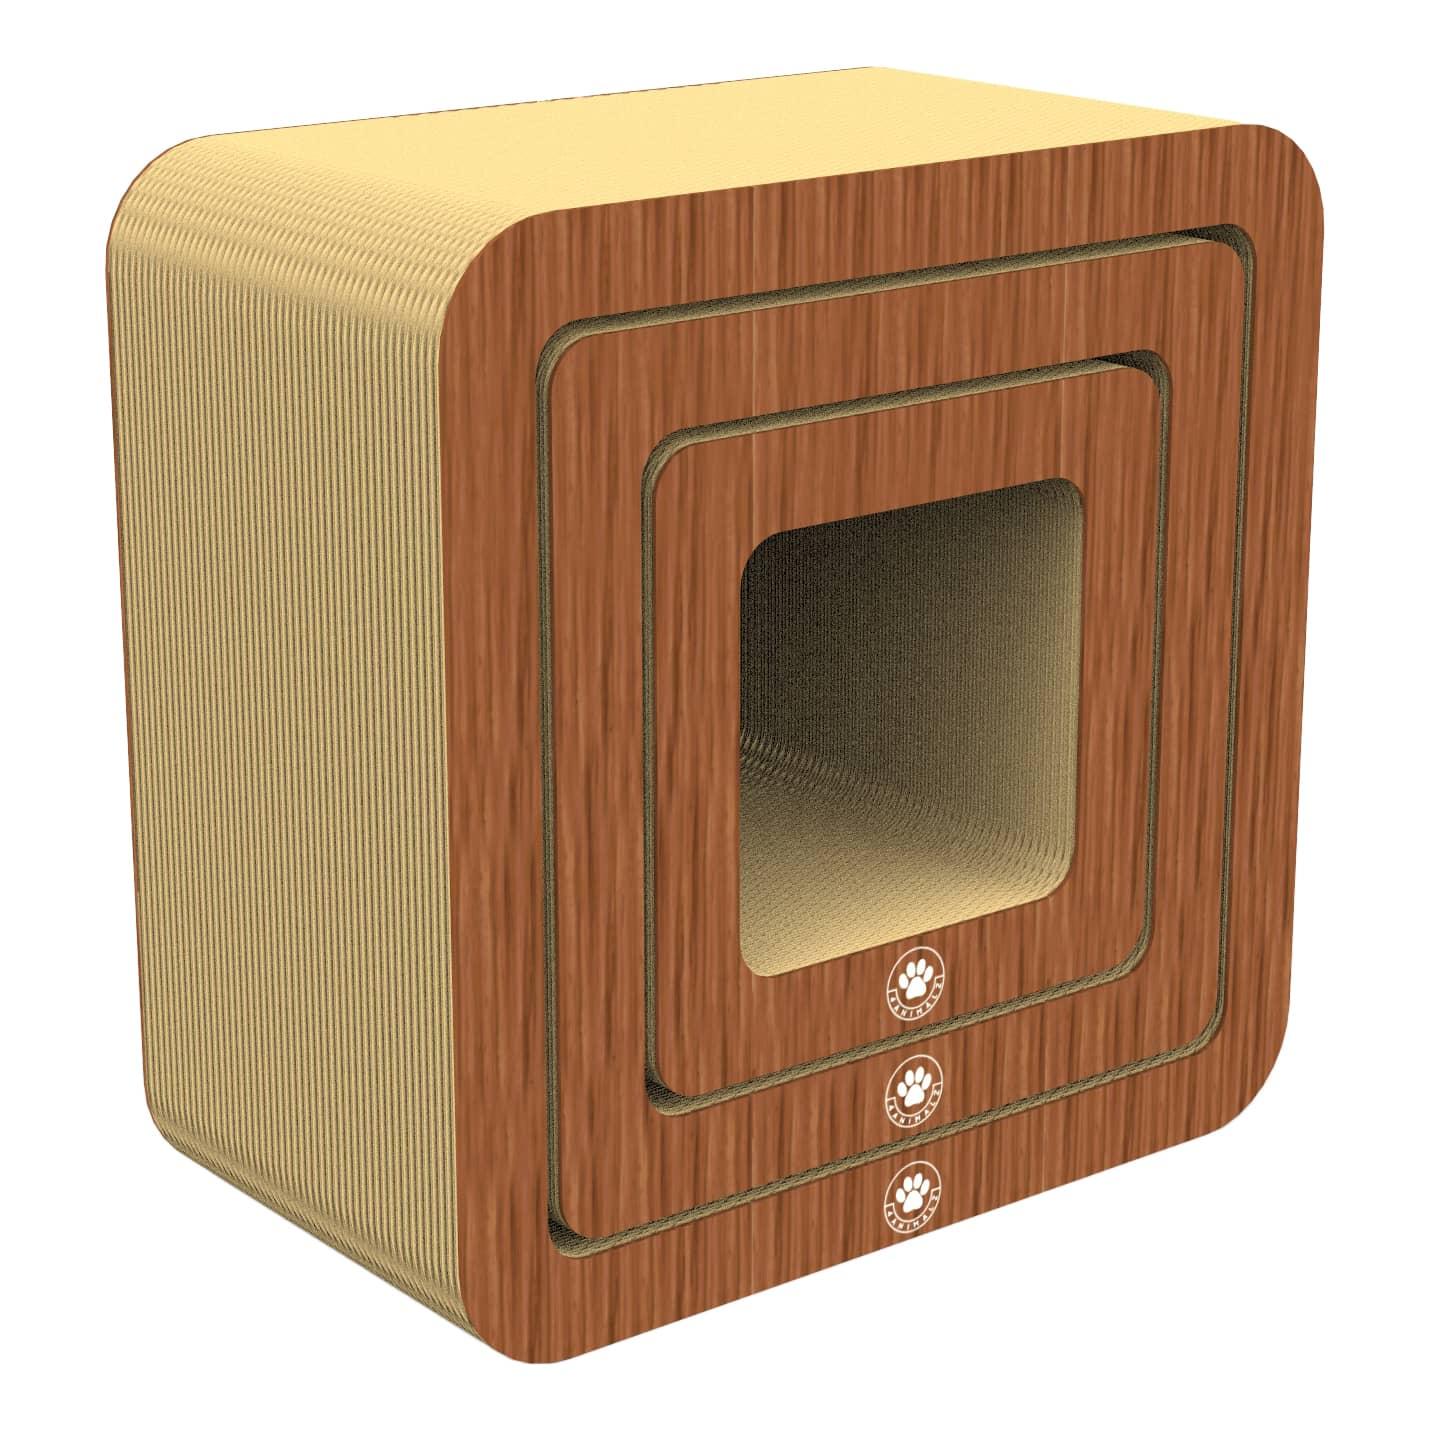 4animalz® Cube Walnut - kartonnen krabpaal katten - 45x24x45cm - Bruin